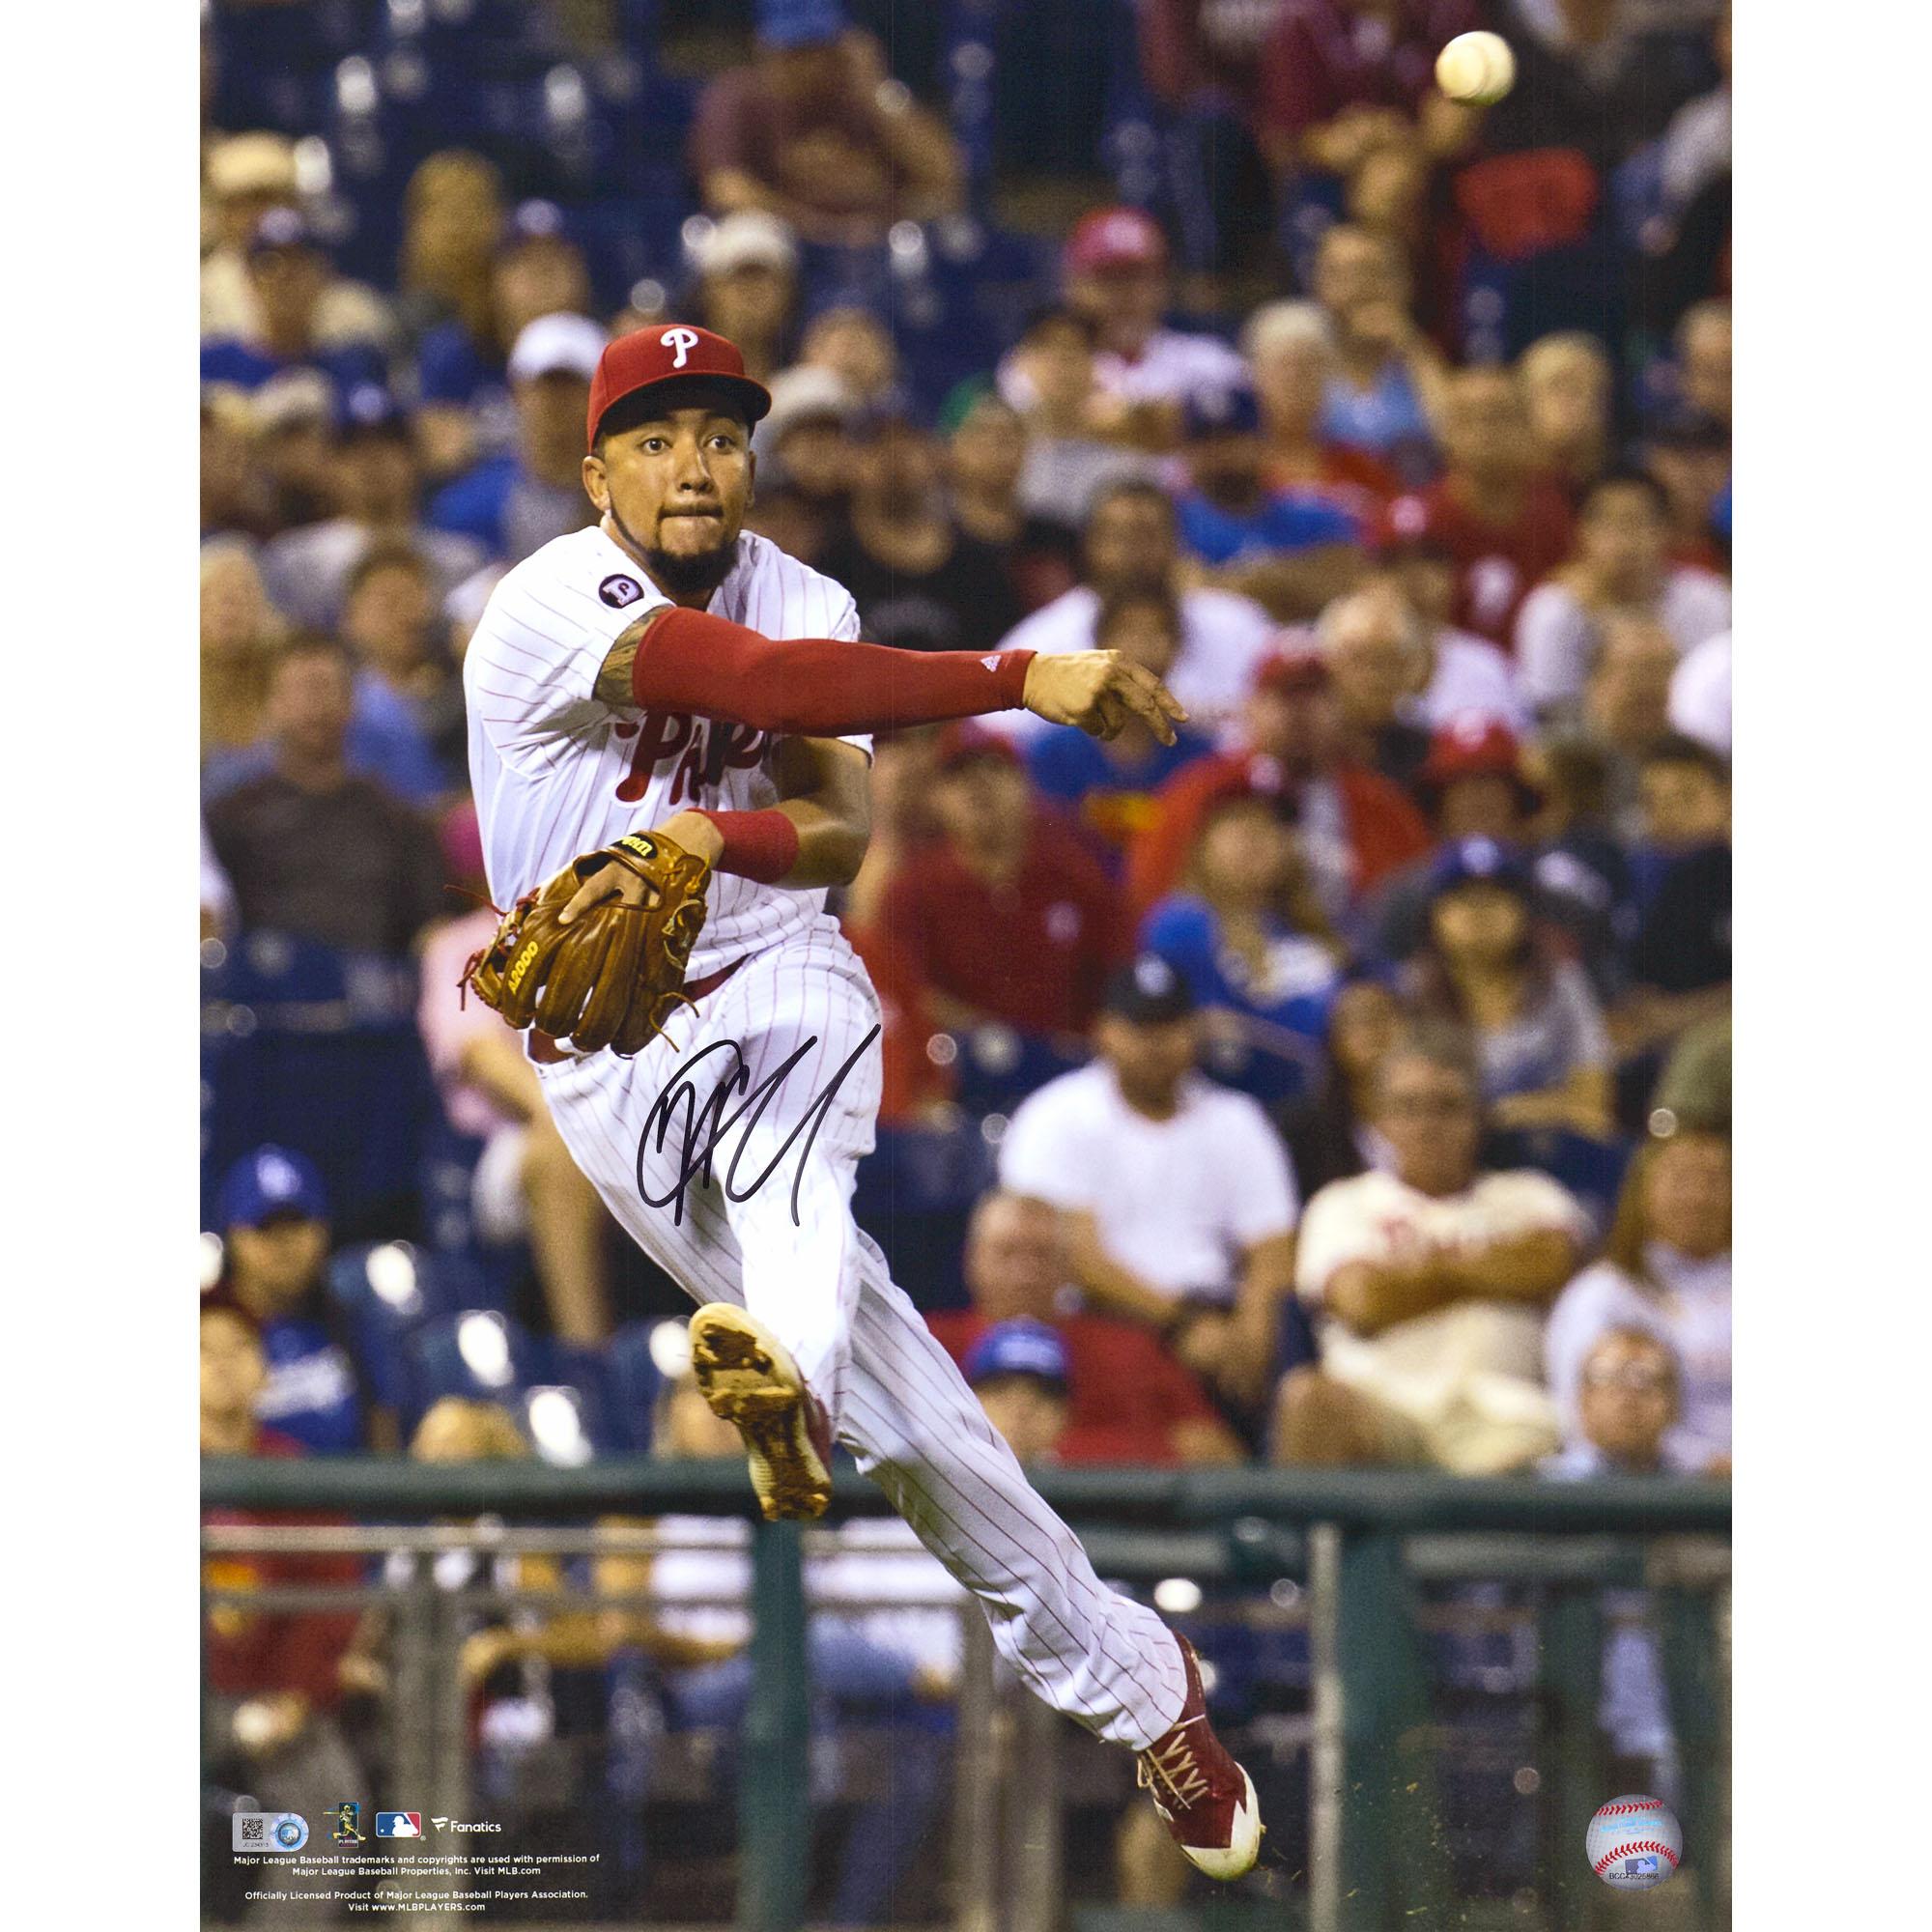 "JP Crawford Philadelphia Phillies Fanatics Authentic Autographed 16"" x 20"" Throwing Ball Photograph - No Size"